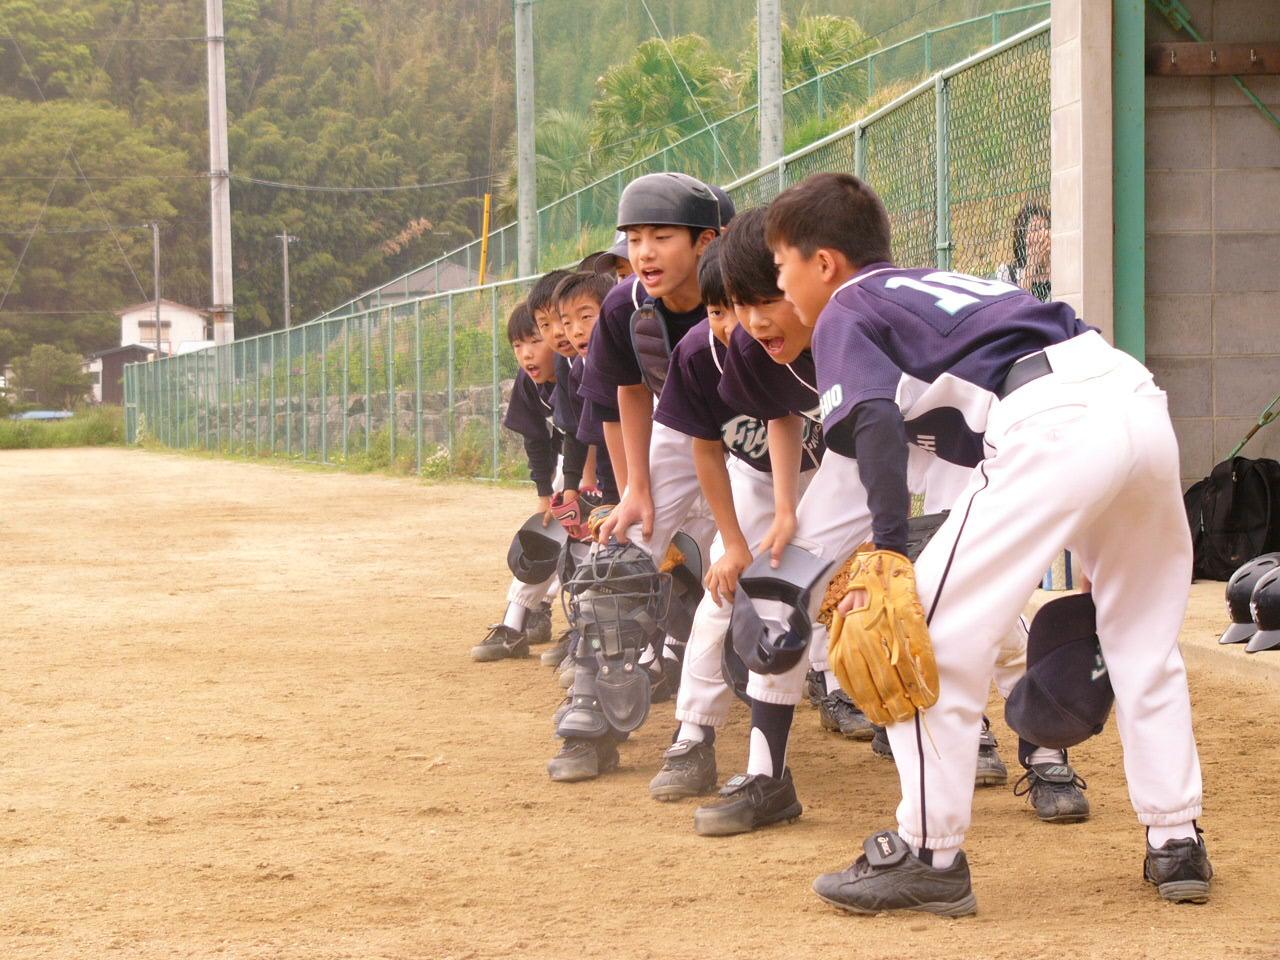 幡豆ドラ大会3日目 (1)